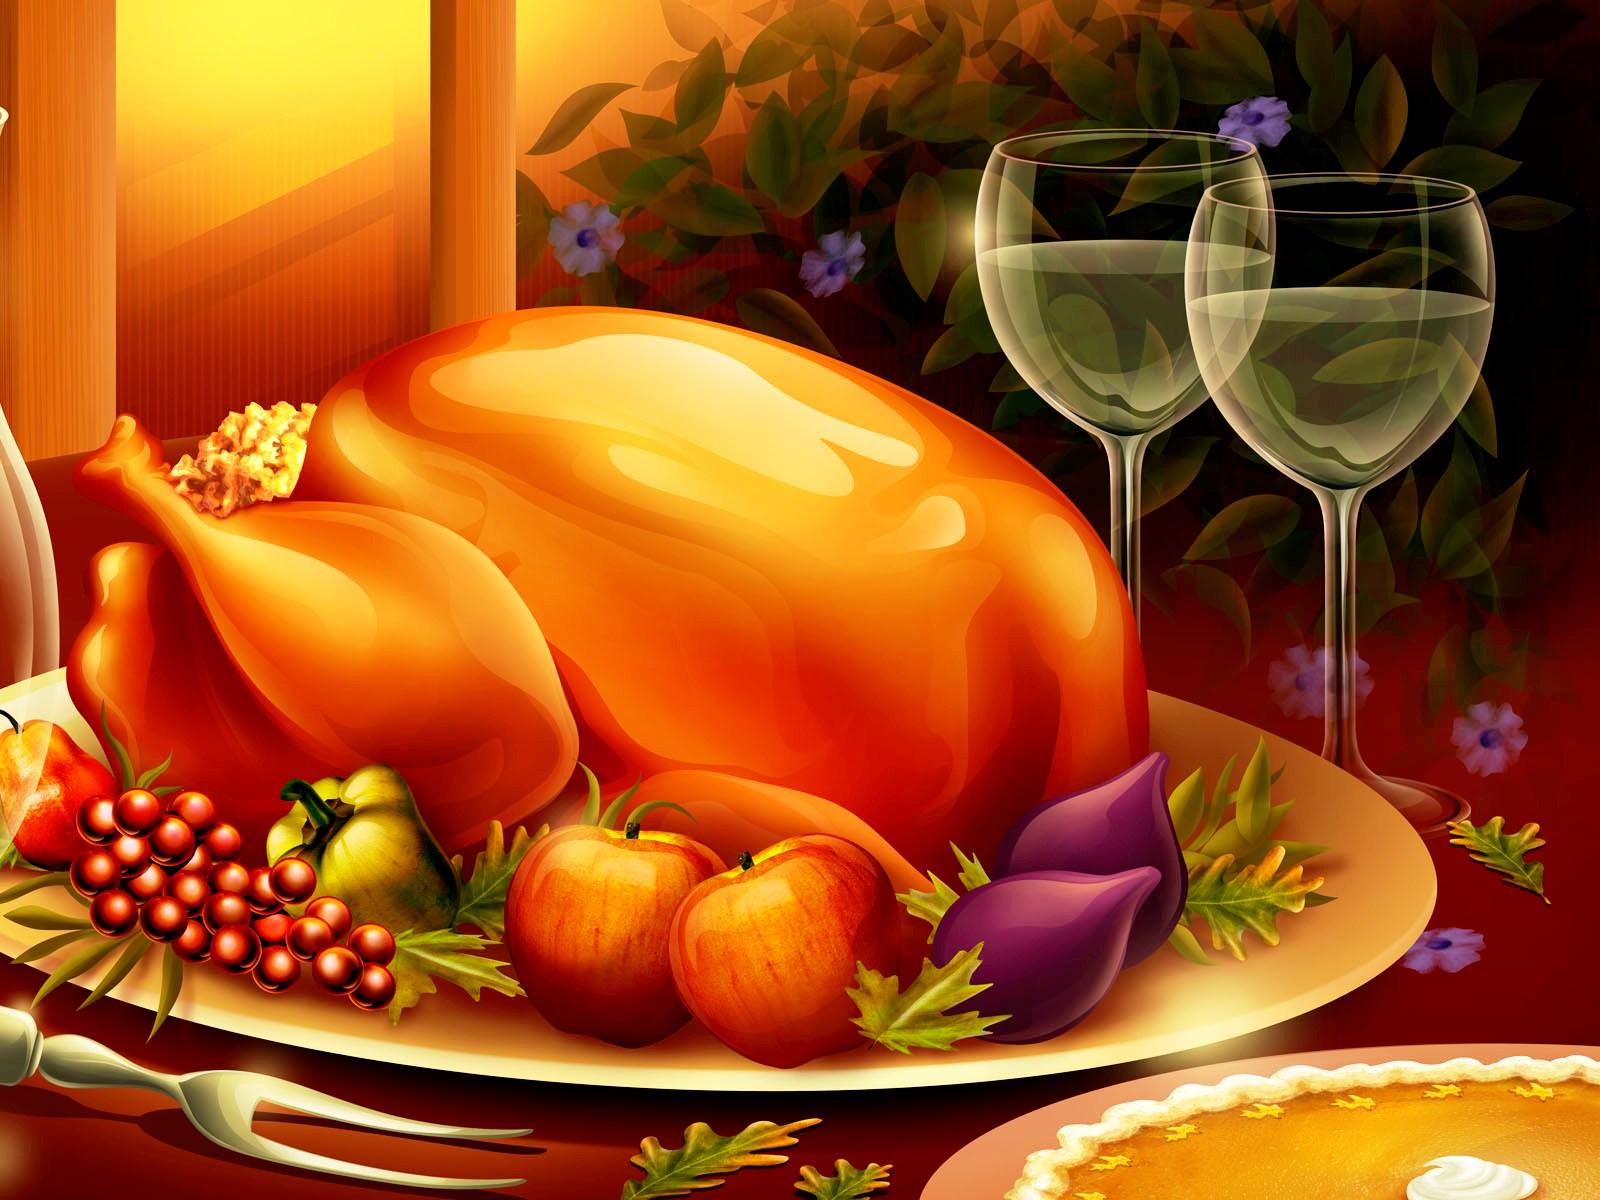 3D Thanksgiving Wallpapers HD 1600x1200